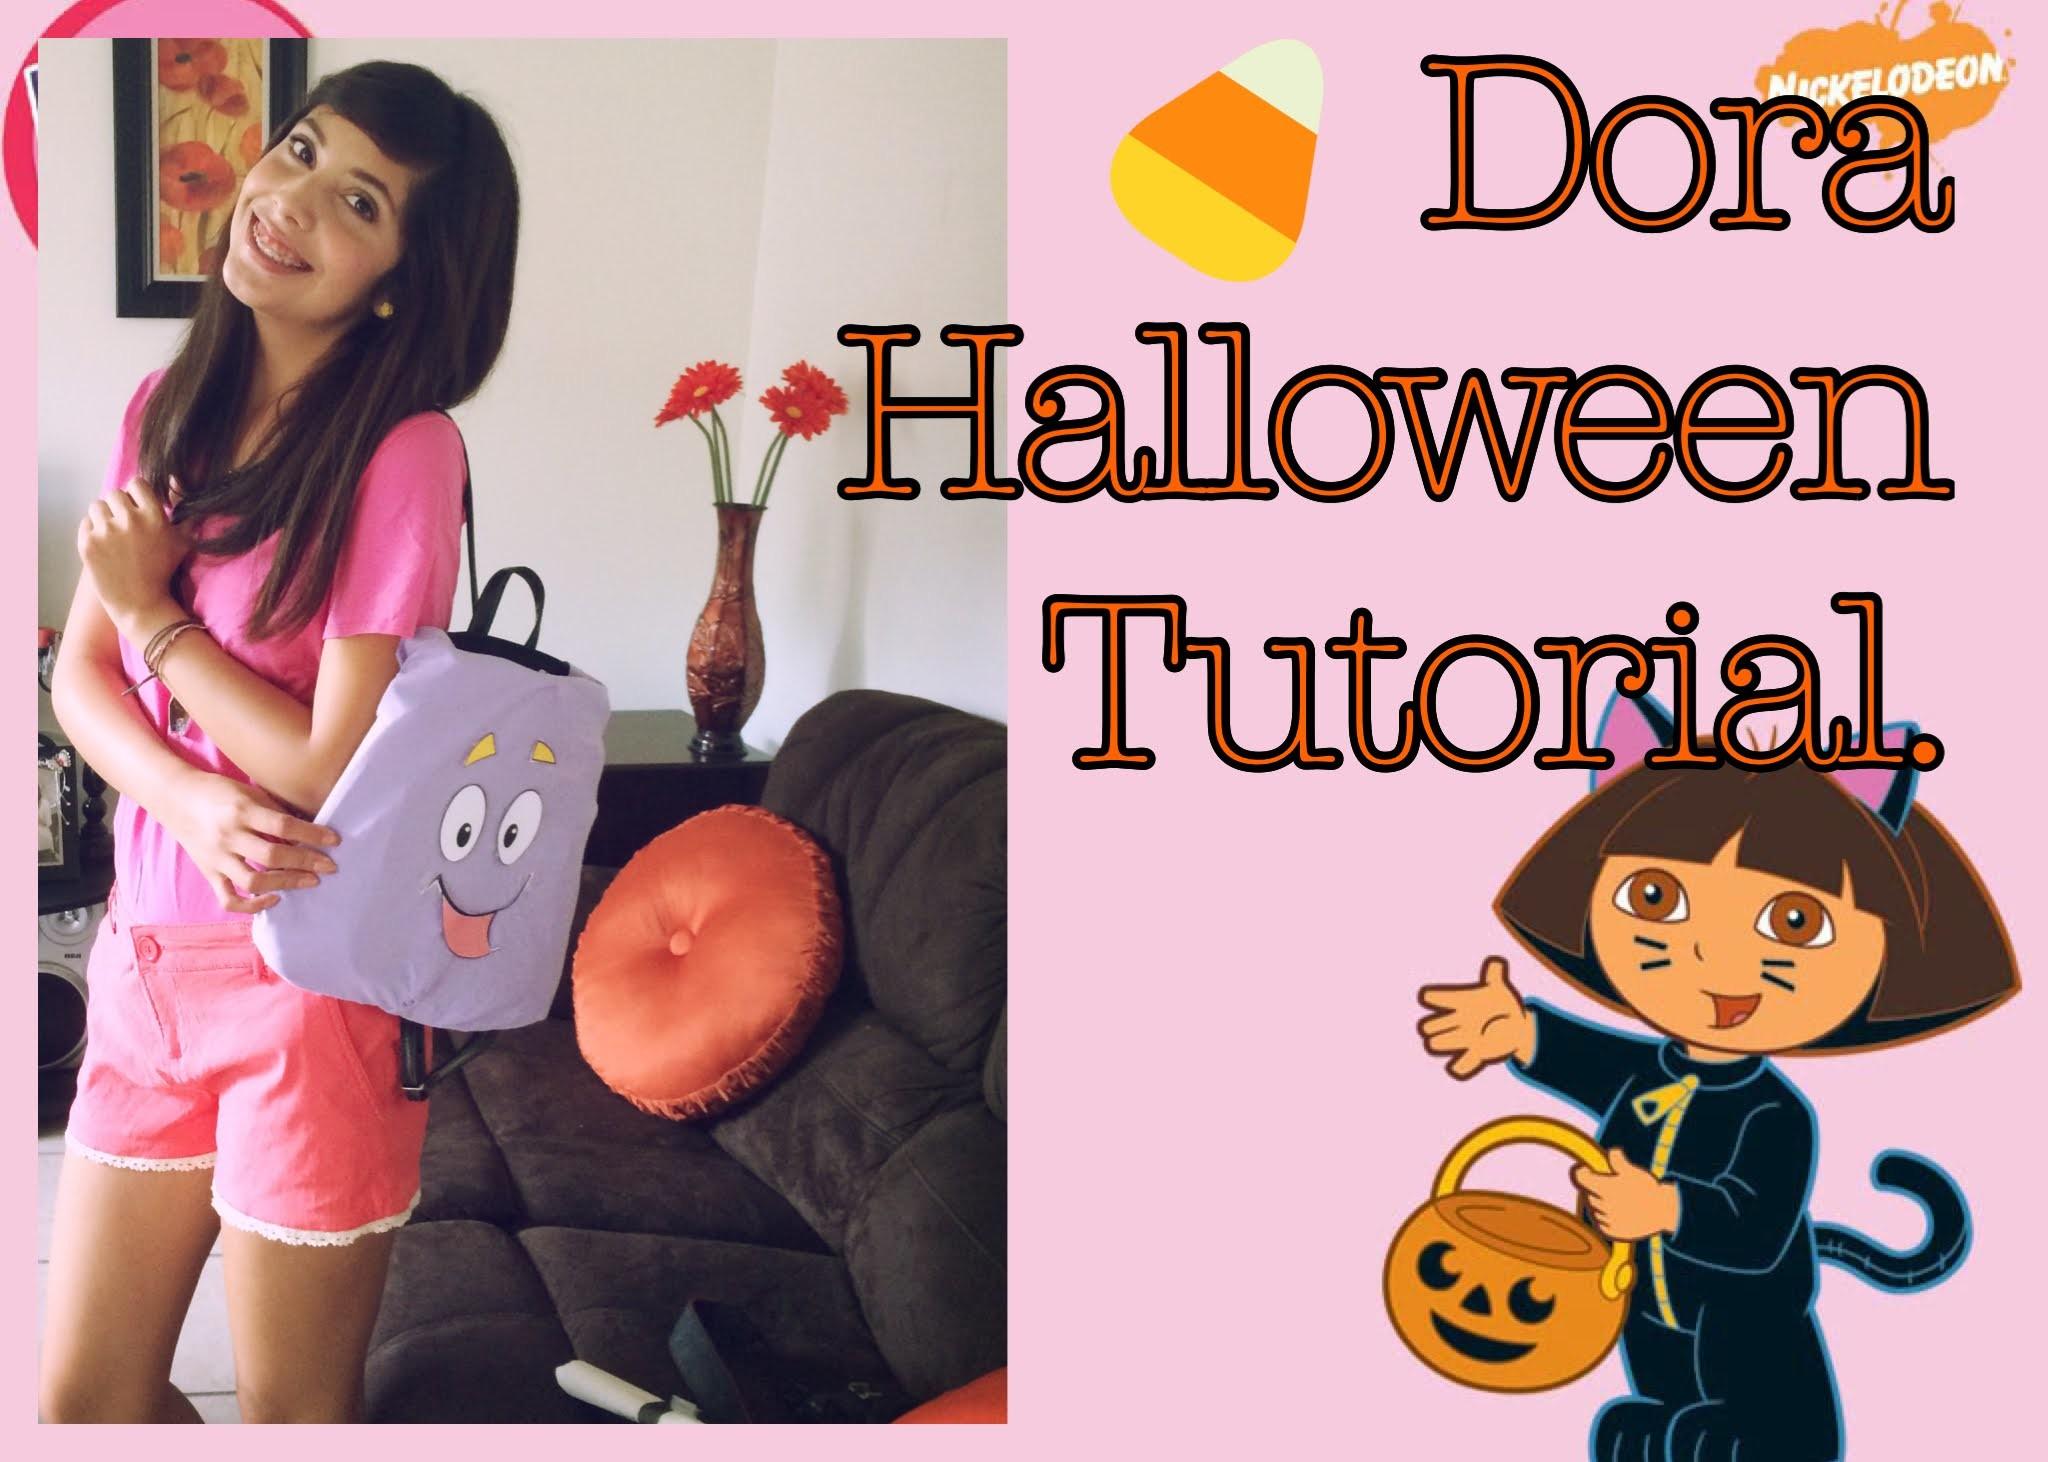 Dora the Explorer Halloween Tutorial (+DIY Dora Backpack & Map)